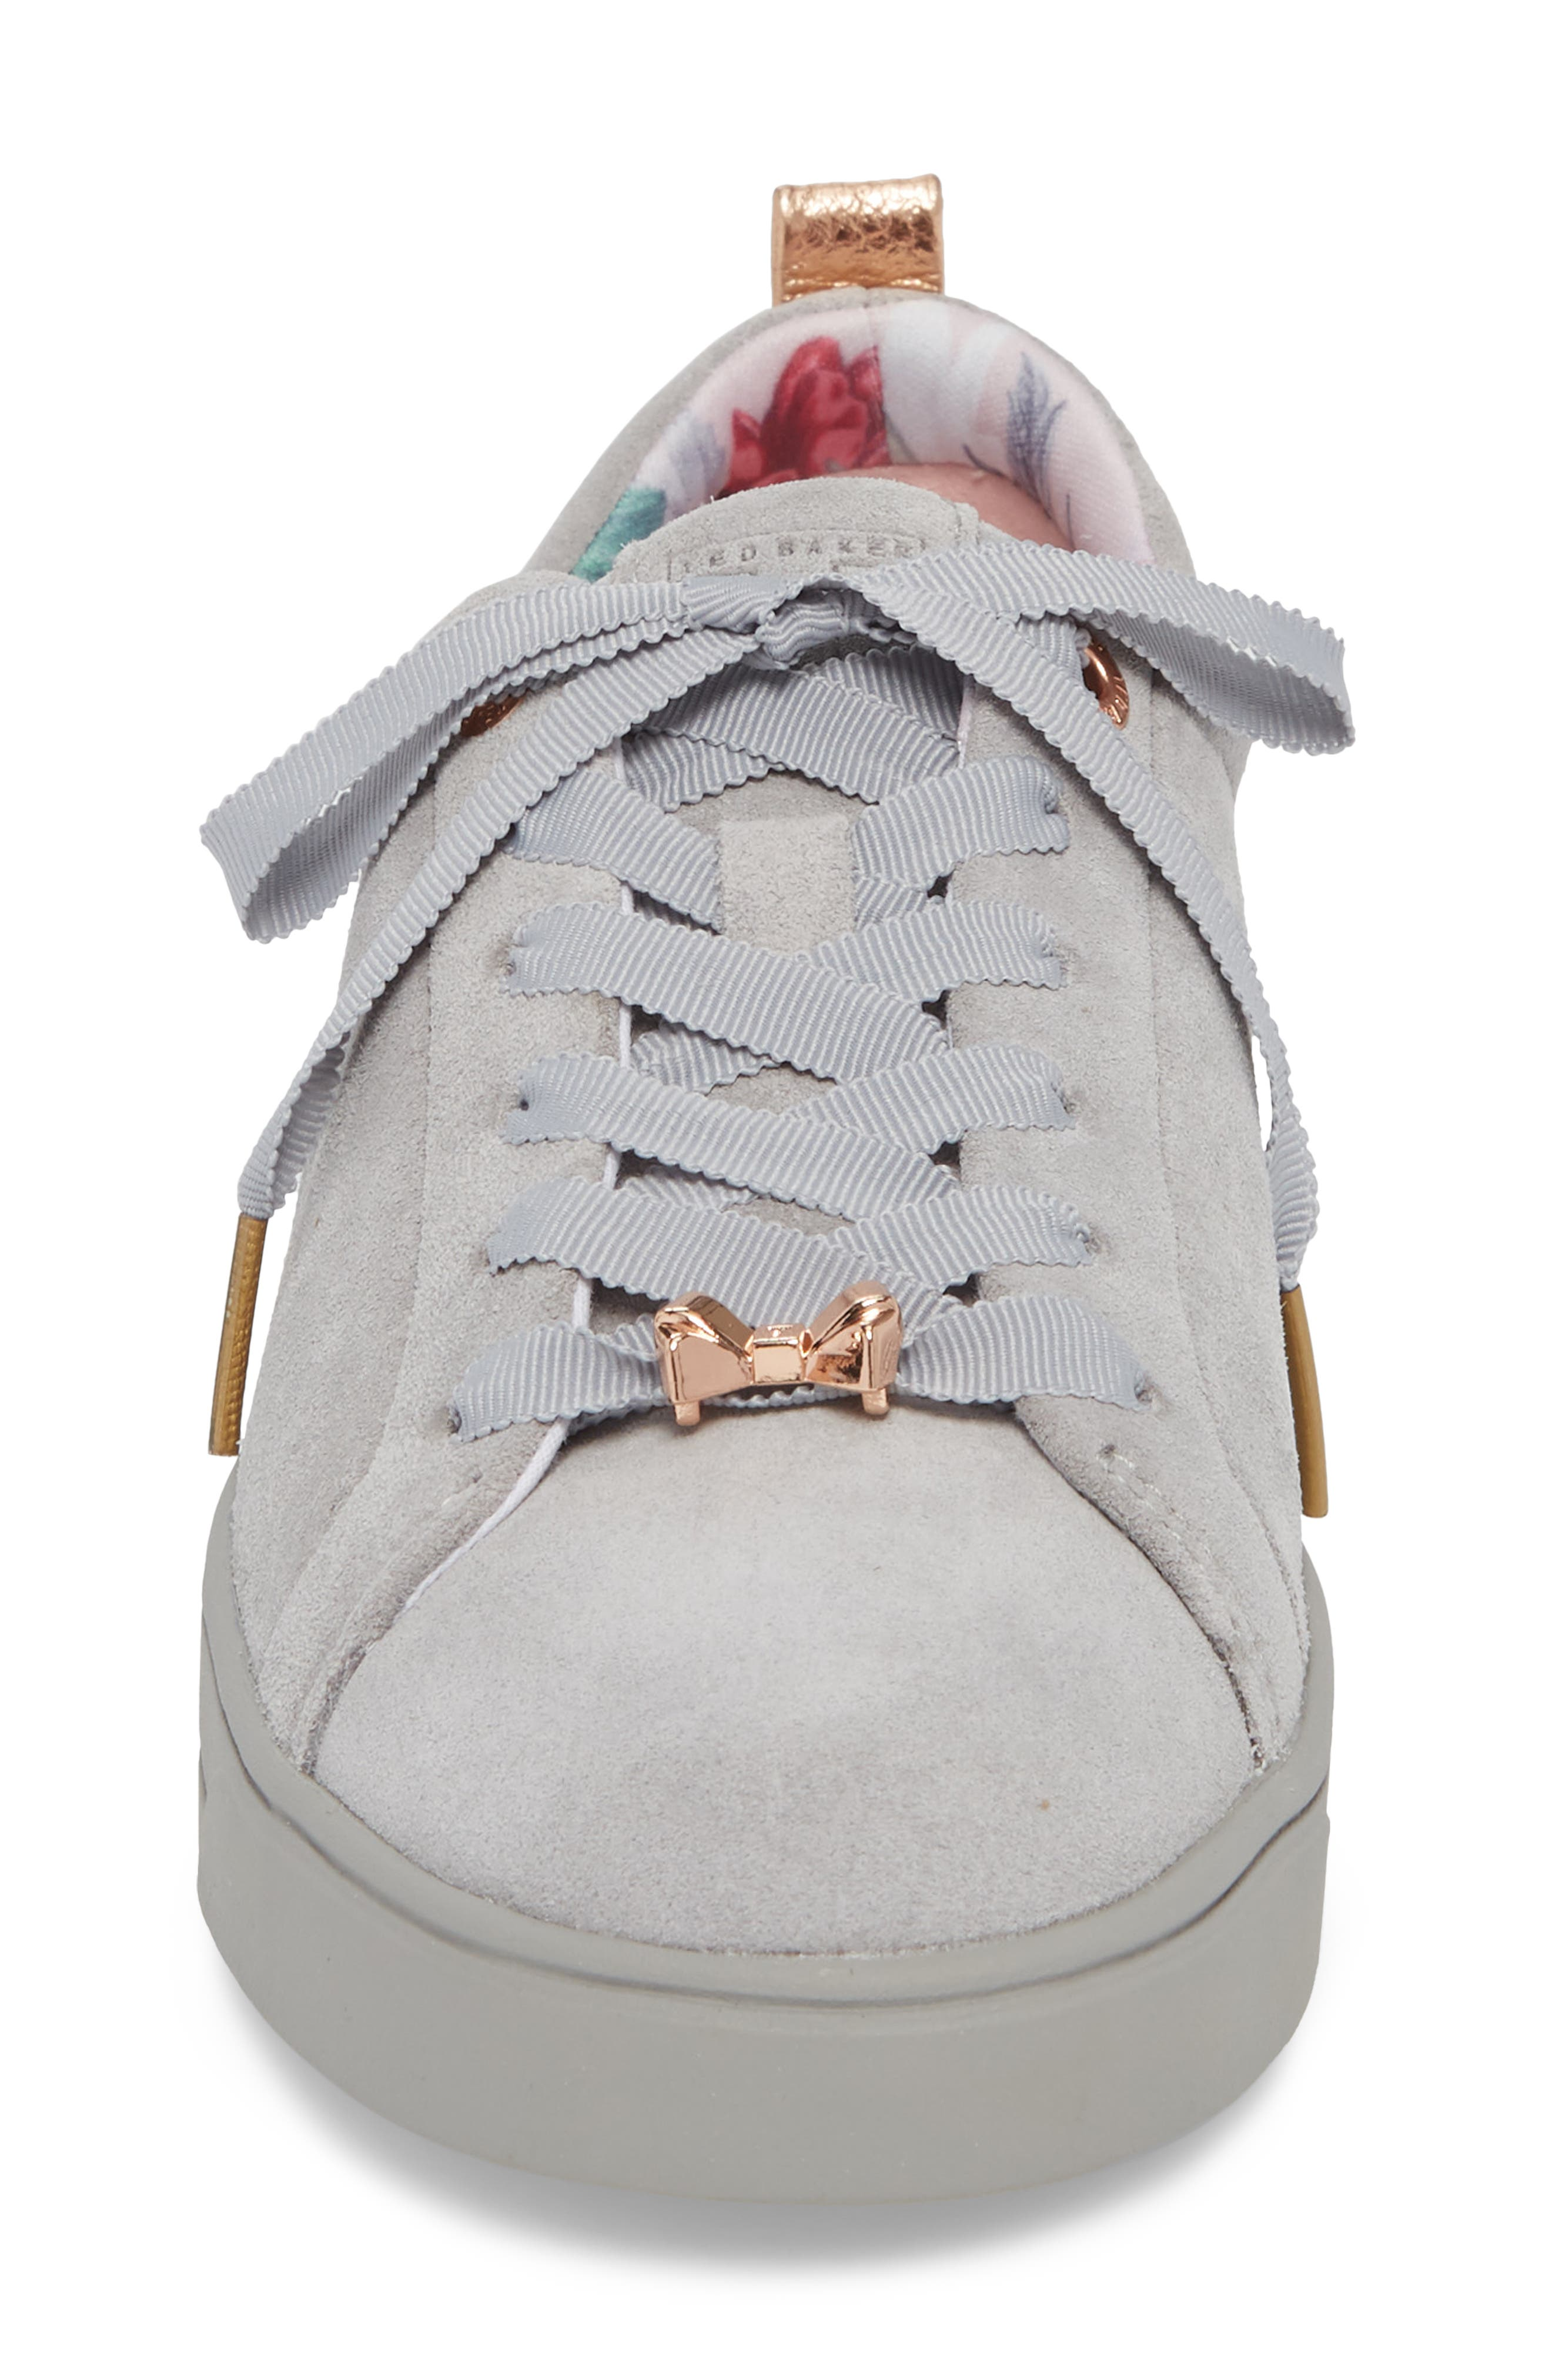 Kelleis Sneaker,                             Alternate thumbnail 4, color,                             LIGHT GREY SUEDE